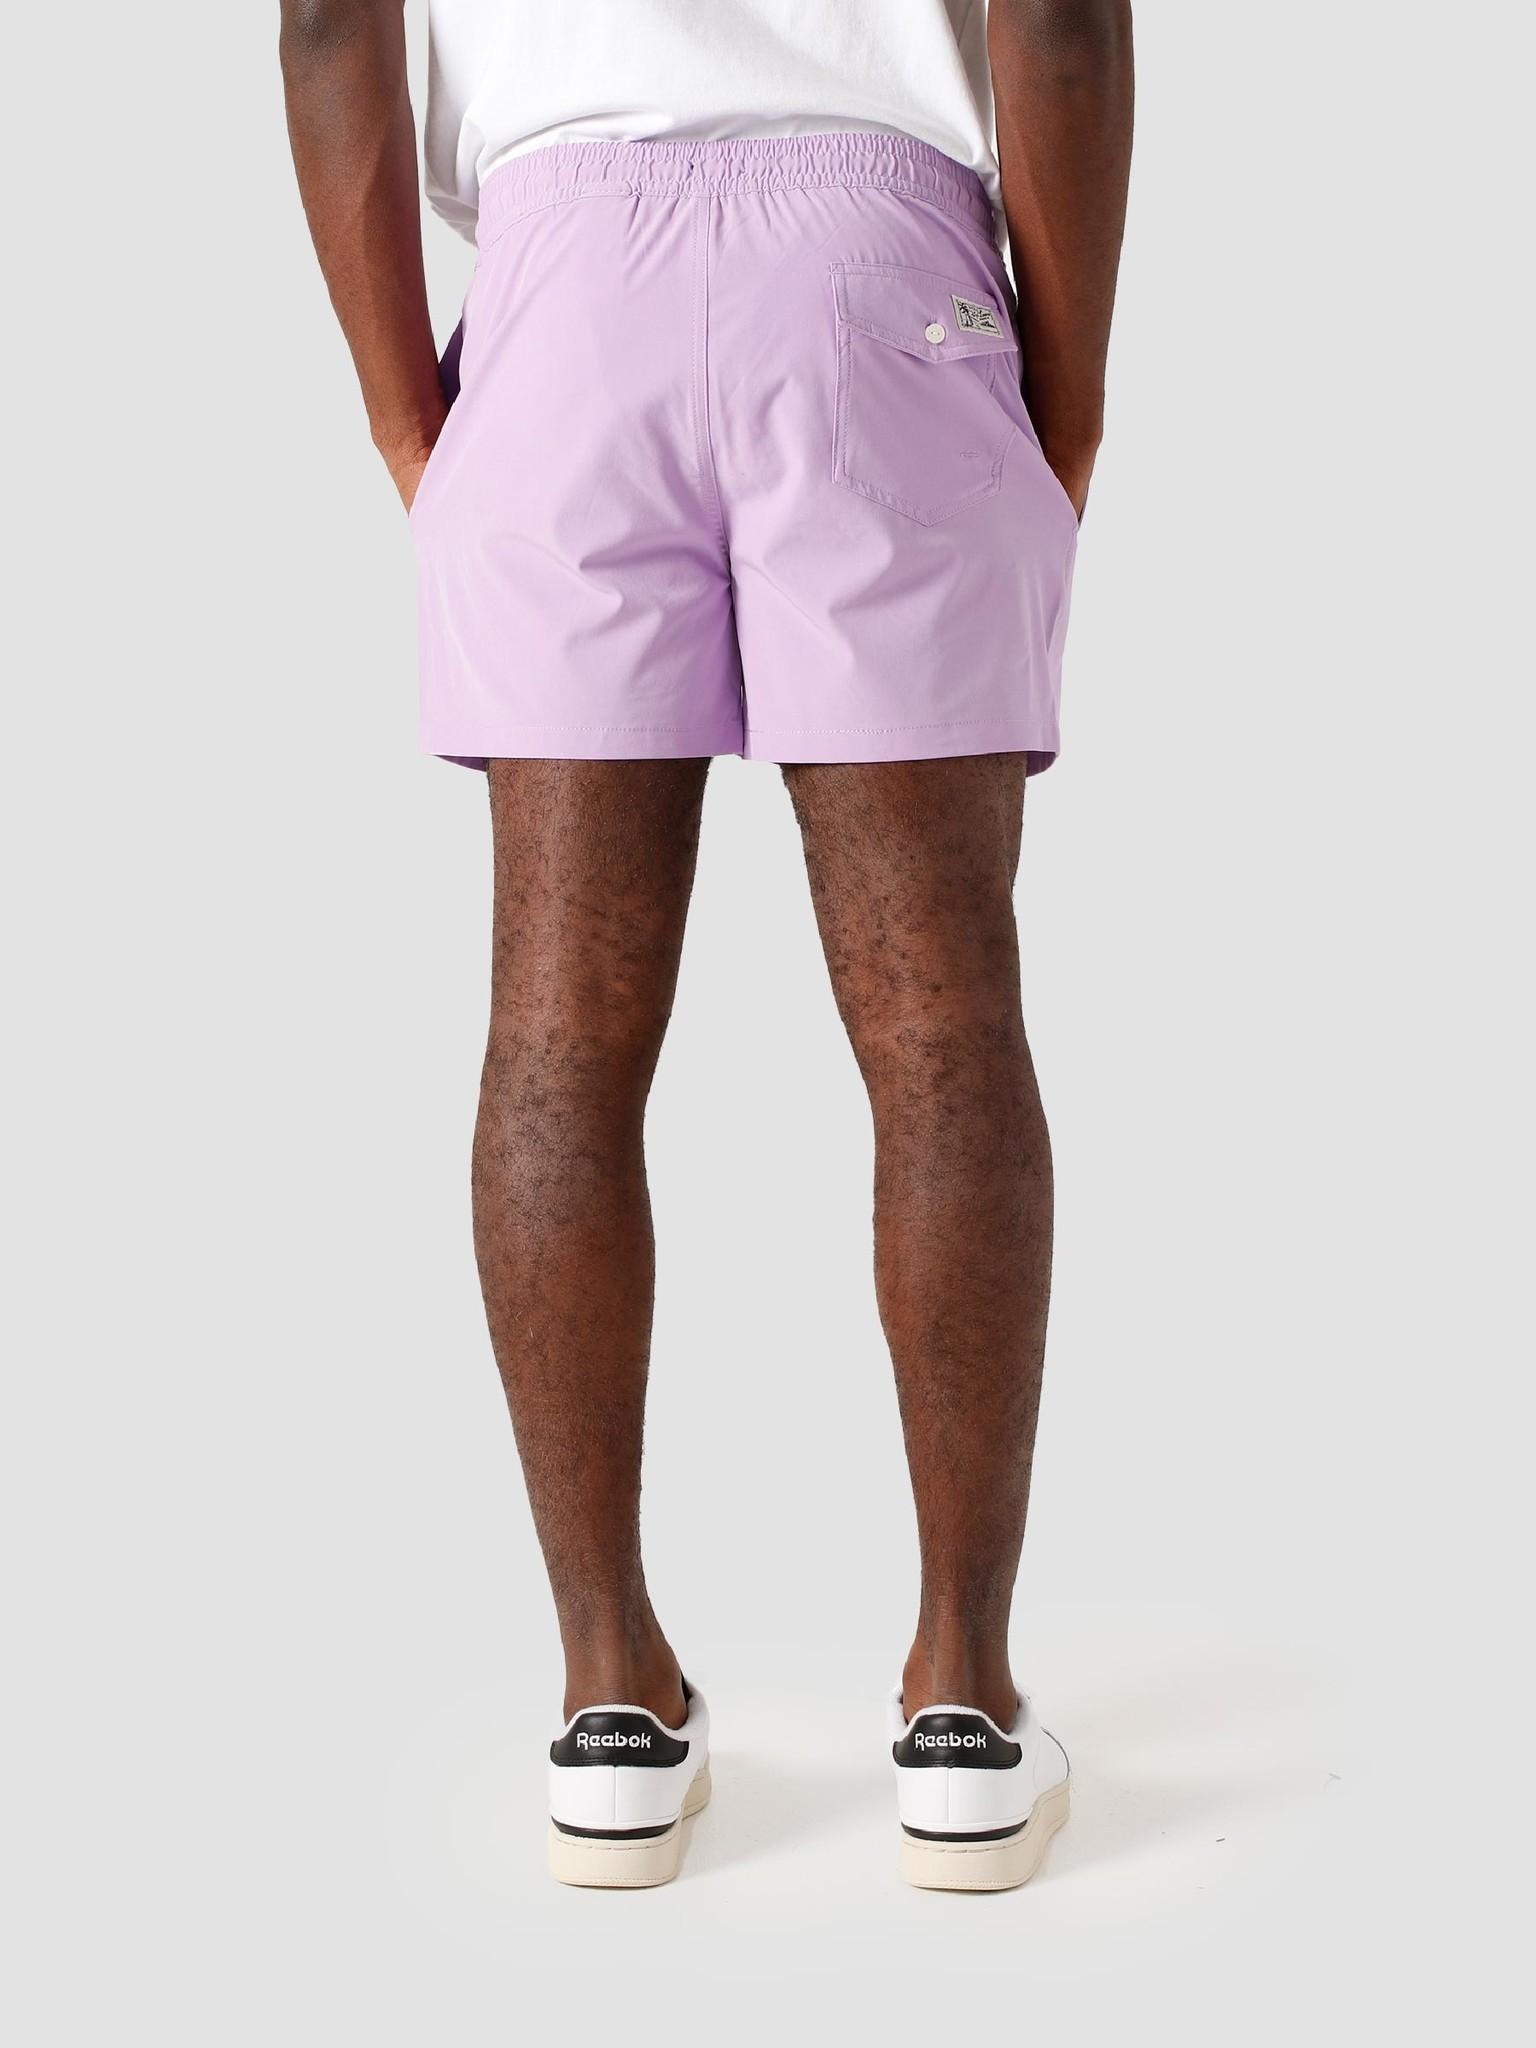 Polo Ralph Lauren Polo Ralph Lauren Recycled Polyester Traveler Short English Lavender 710837404004